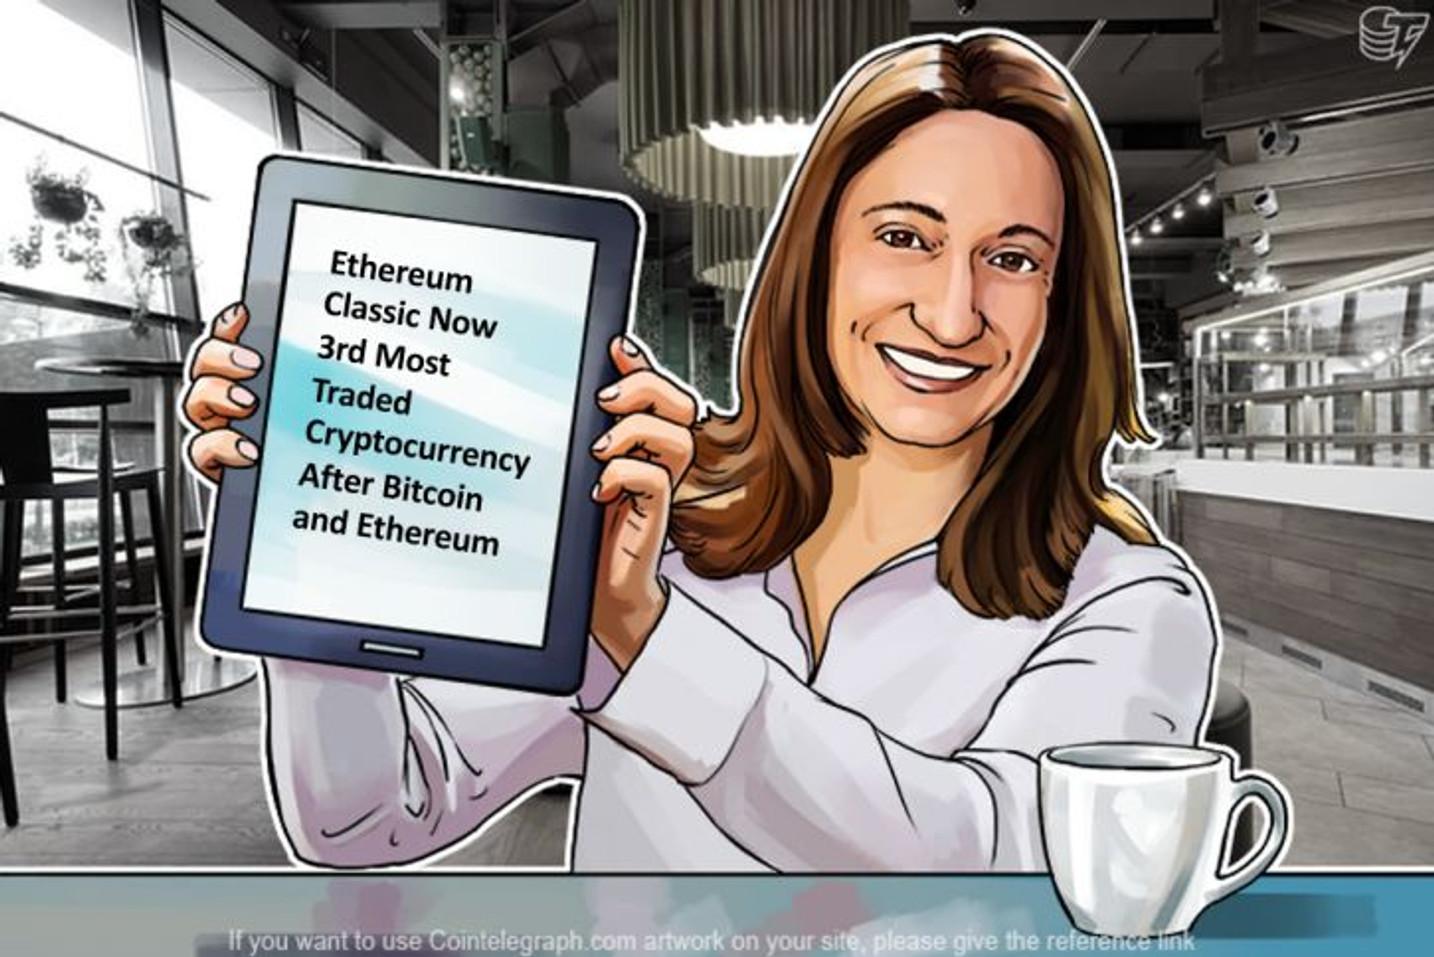 Ethereum Classicがついにビットコイン、イーサリアムに続いて最も取引された暗号通貨になる